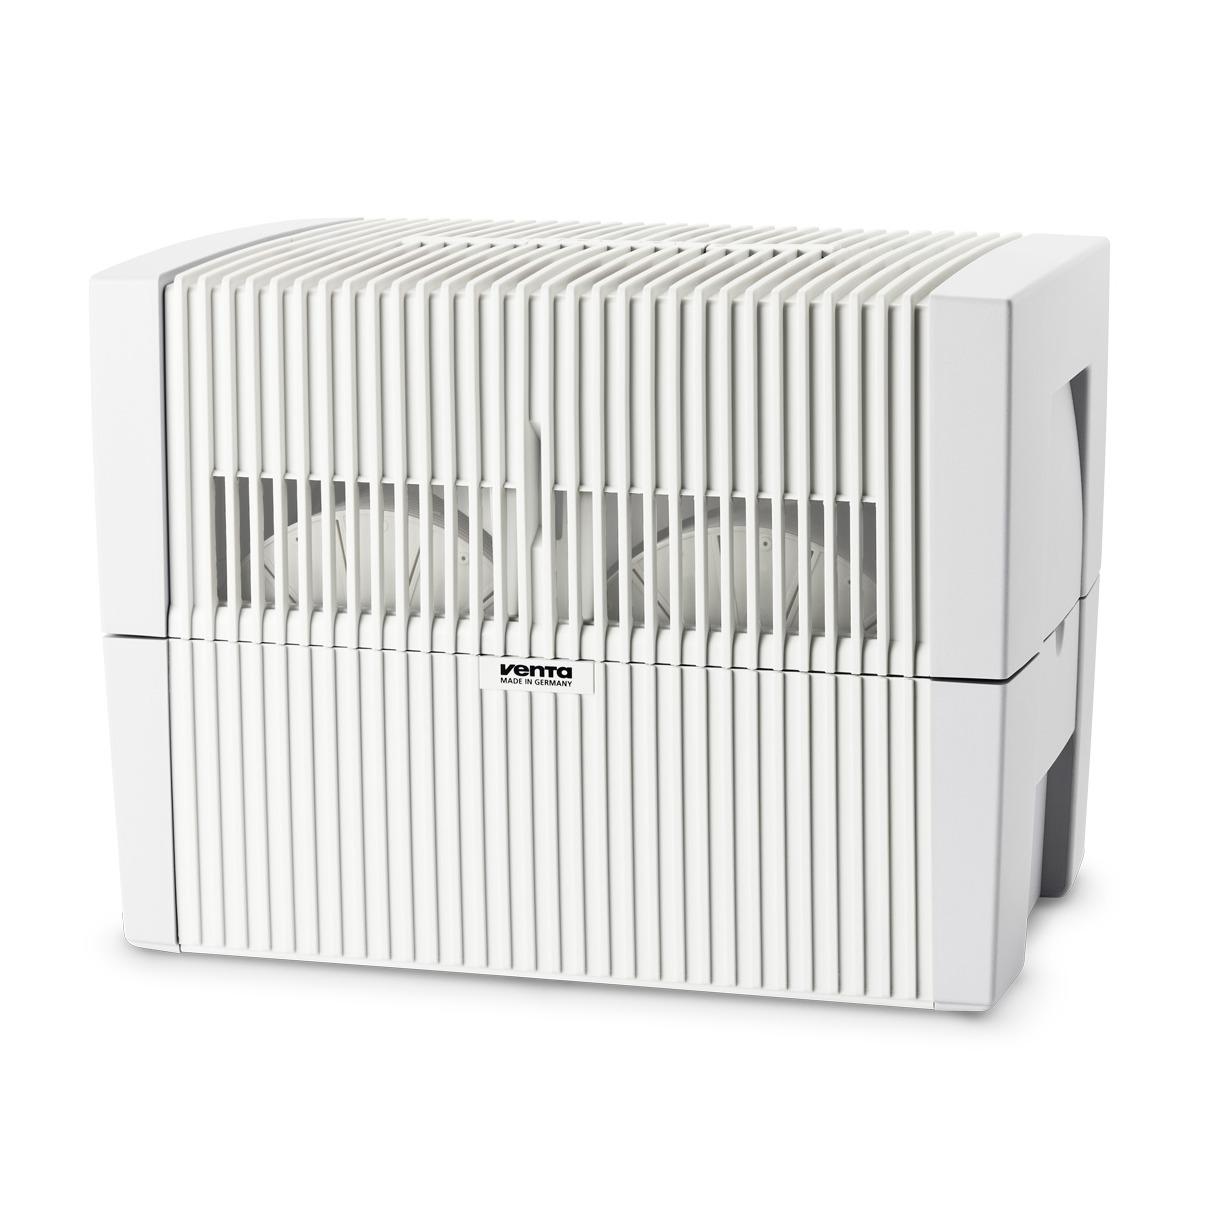 Venta luchtbevochtiger LW45 wit - Prijsvergelijk